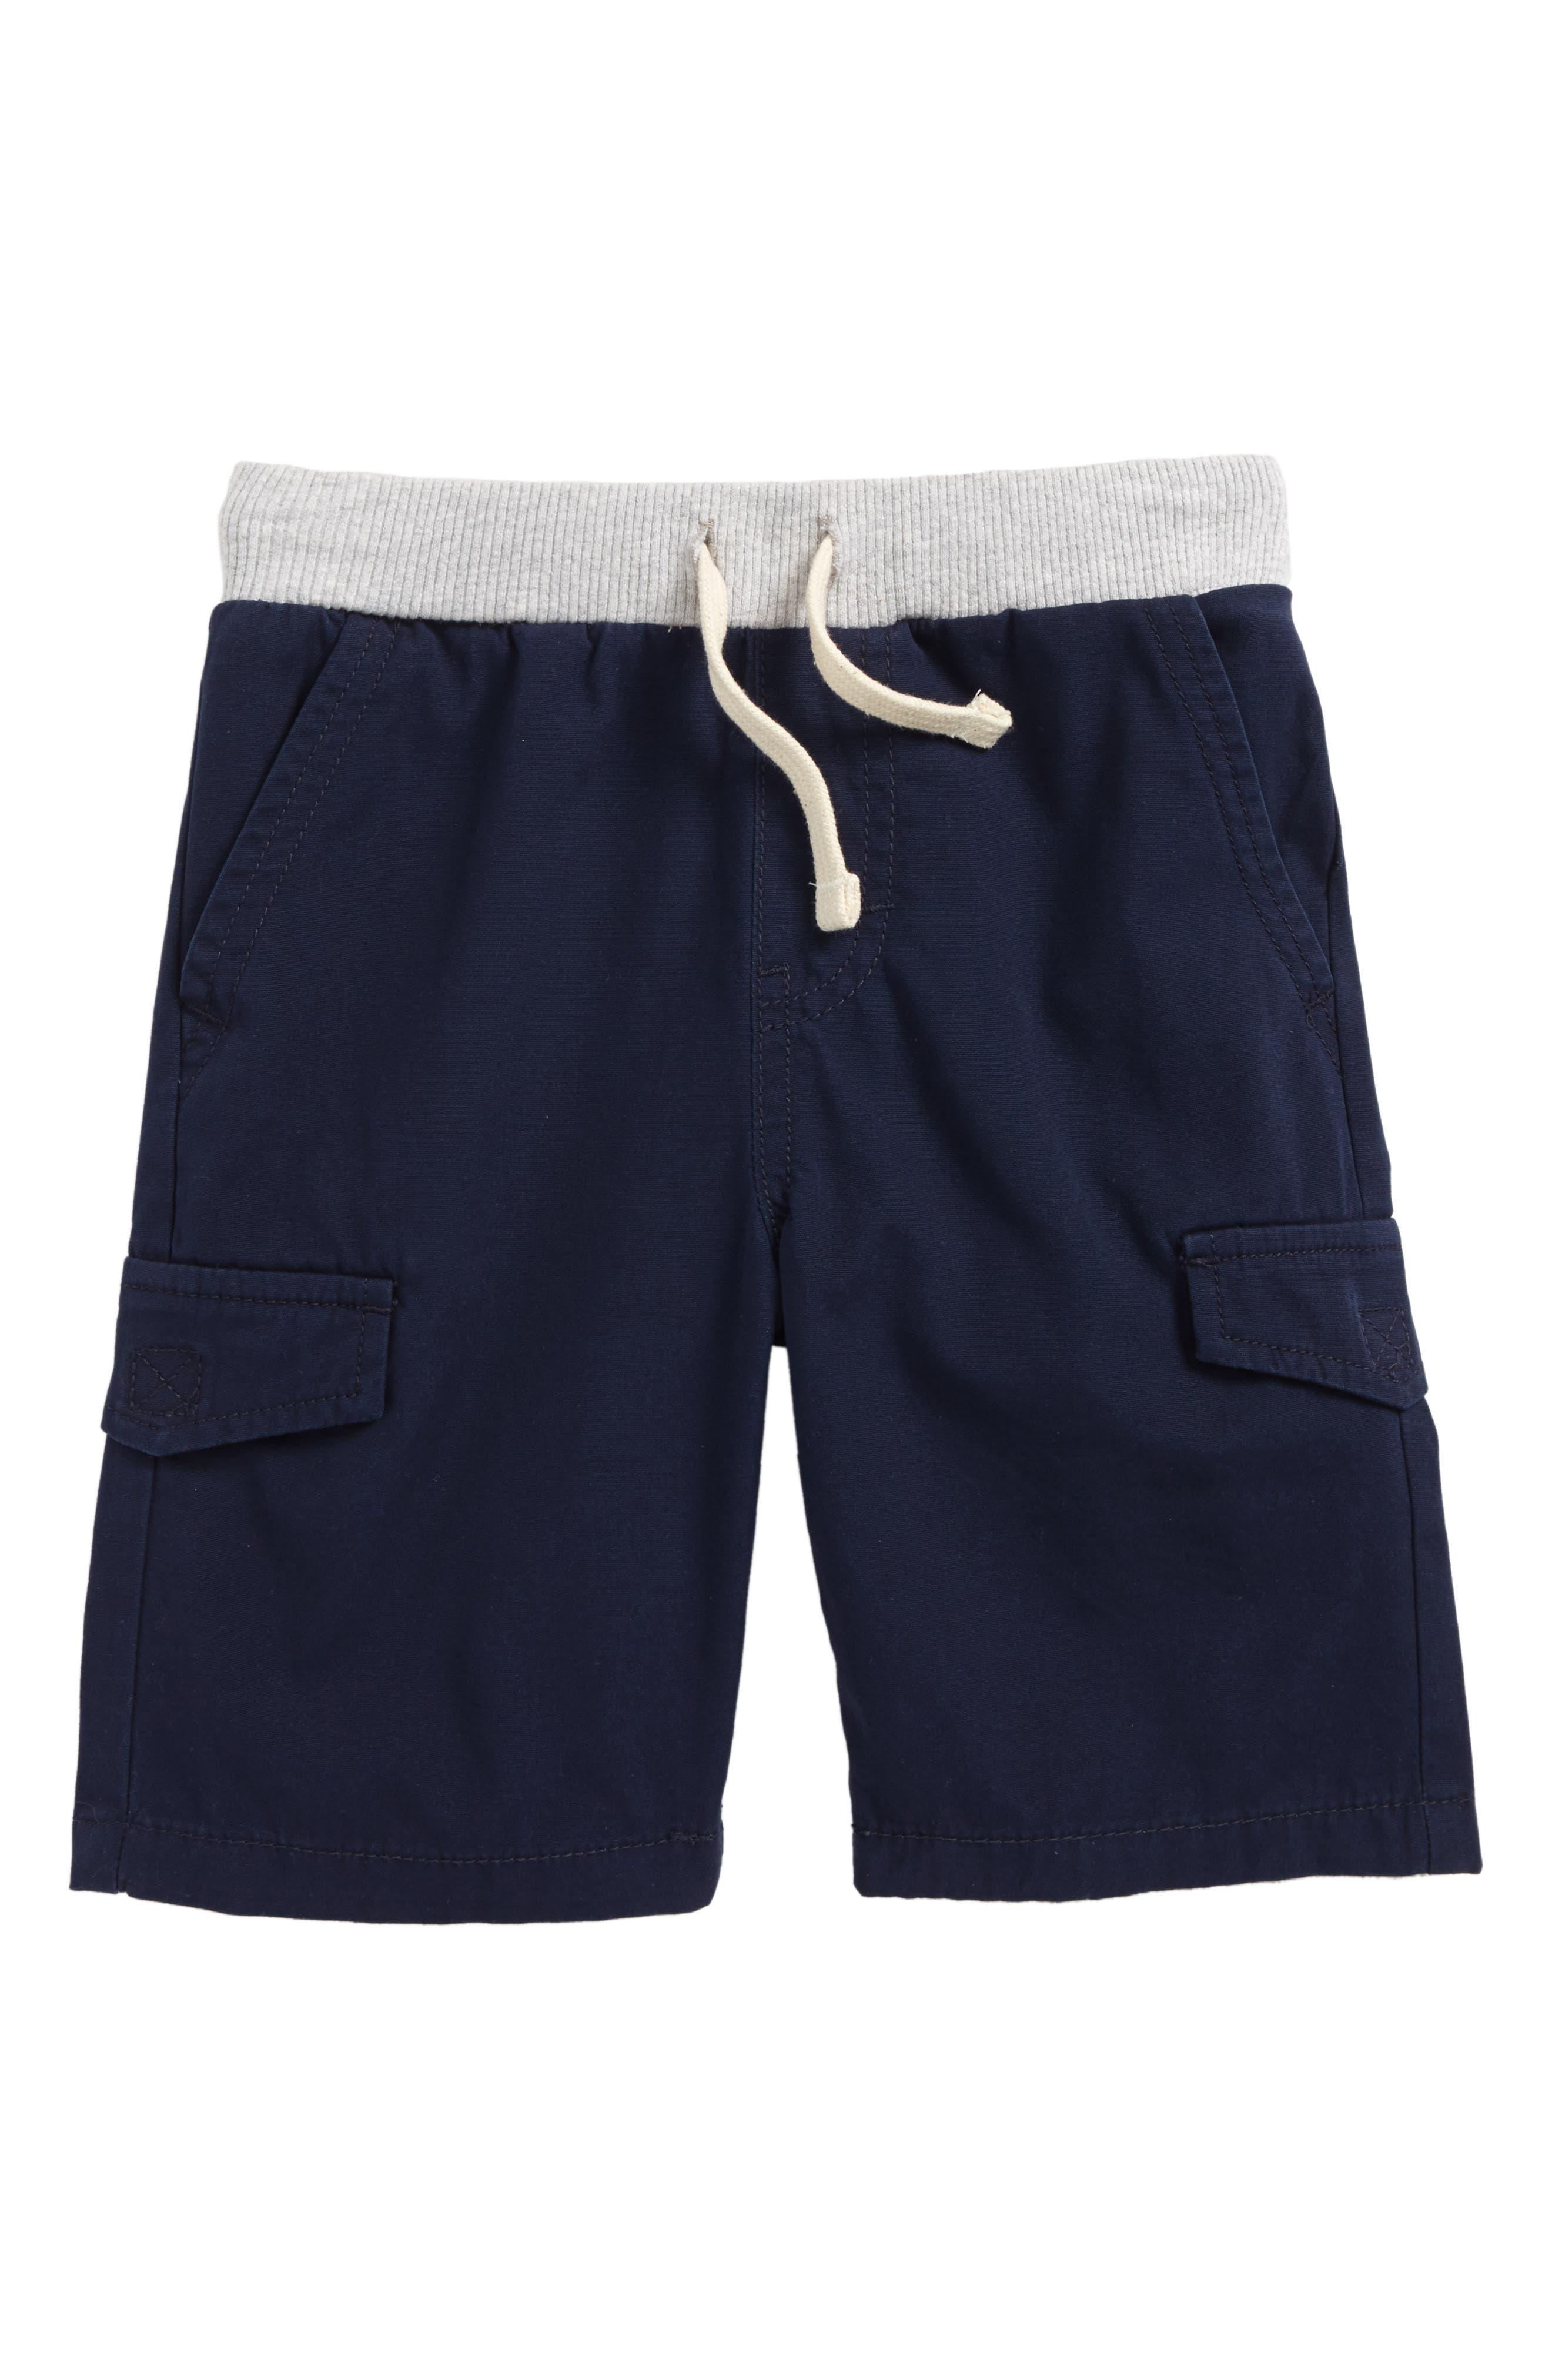 Ribbed Waist Utility Shorts,                         Main,                         color, 411